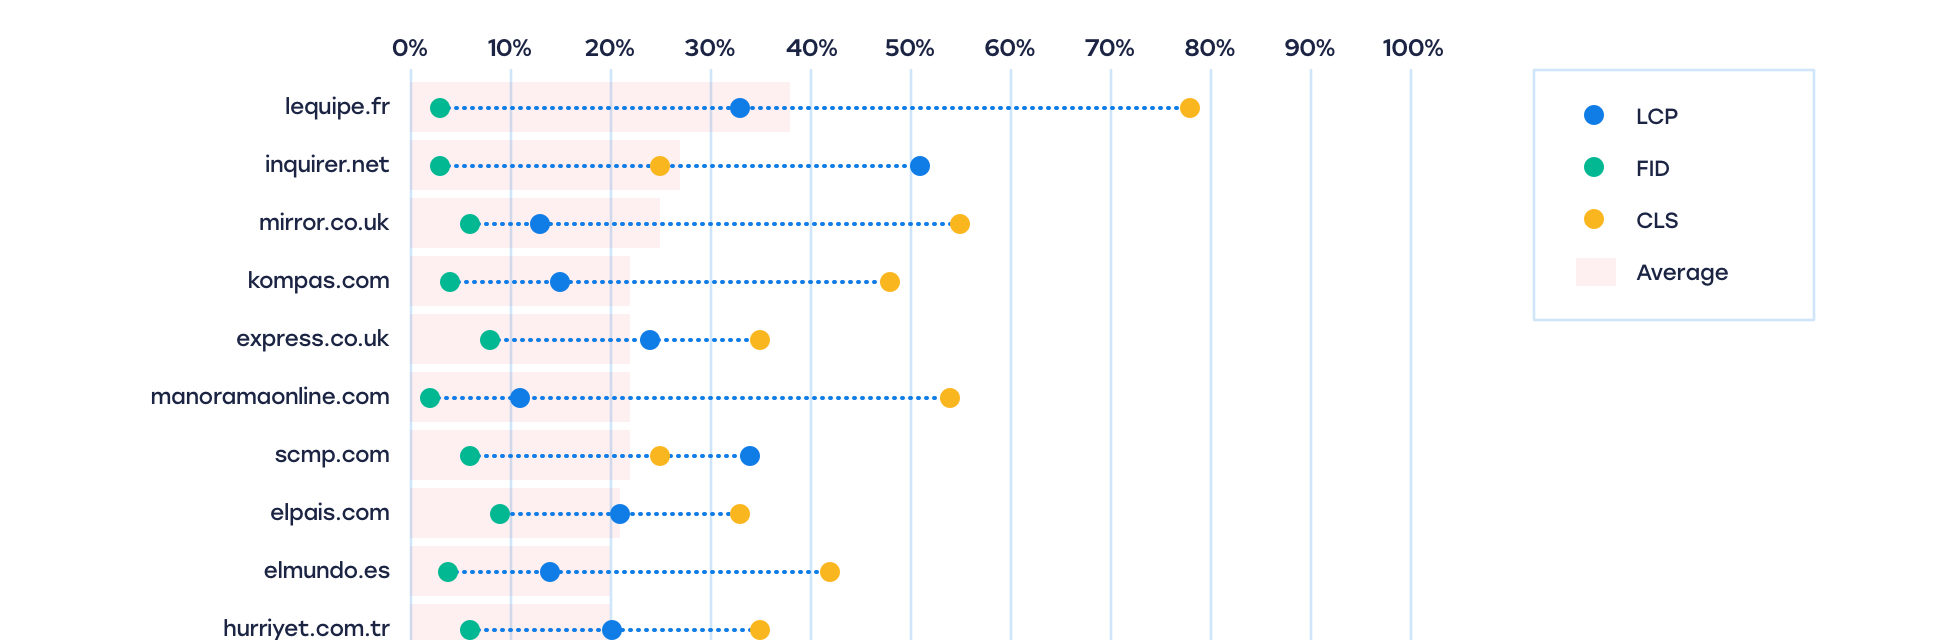 Graph showing the bottom ten media publications with the worst CWS scores. In descending order from 40% to 20%: 1. leequipe.fr 2. inquirer.net 3. mirror.co.uk 4. kompas.com 5. express.co.uk 6.manoramaonline.com 7. scmp.com 8. elpais.com 9. elmundo.es 10. hurriyet.com.tr